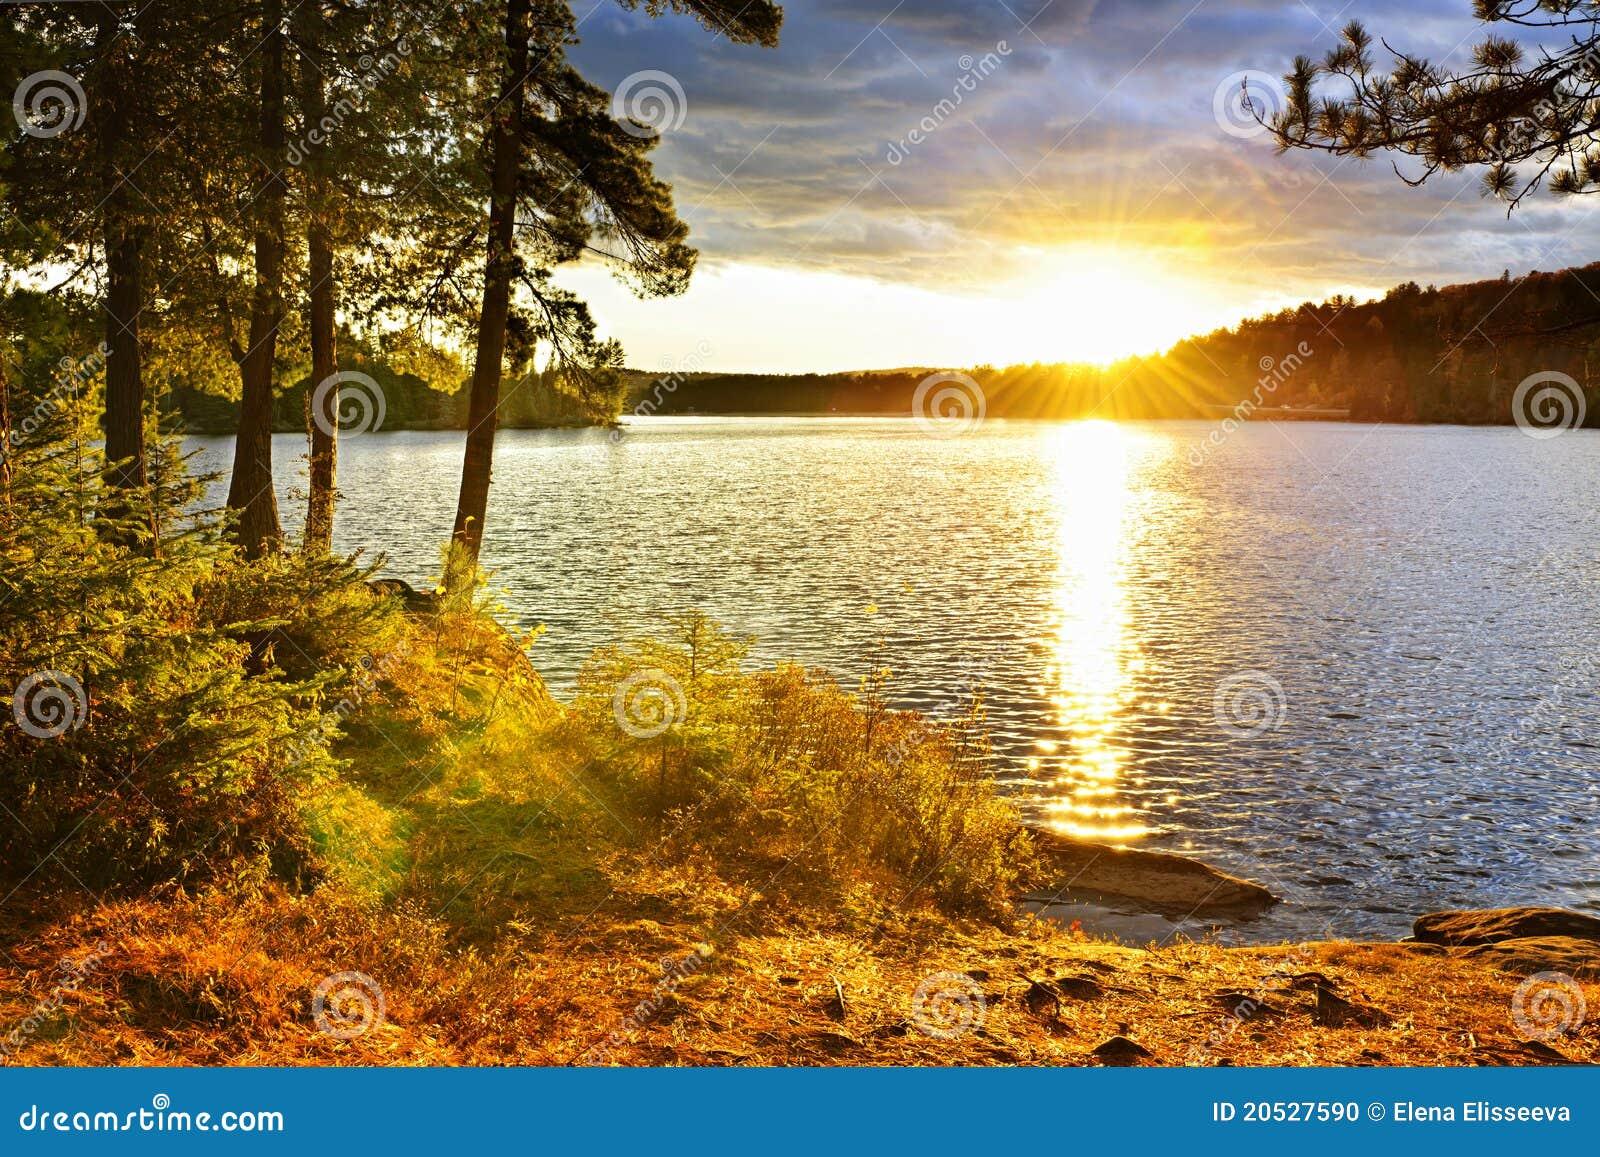 Log cabin on a lake royalty free stock photography image 7866317 - Sunset Over Lake